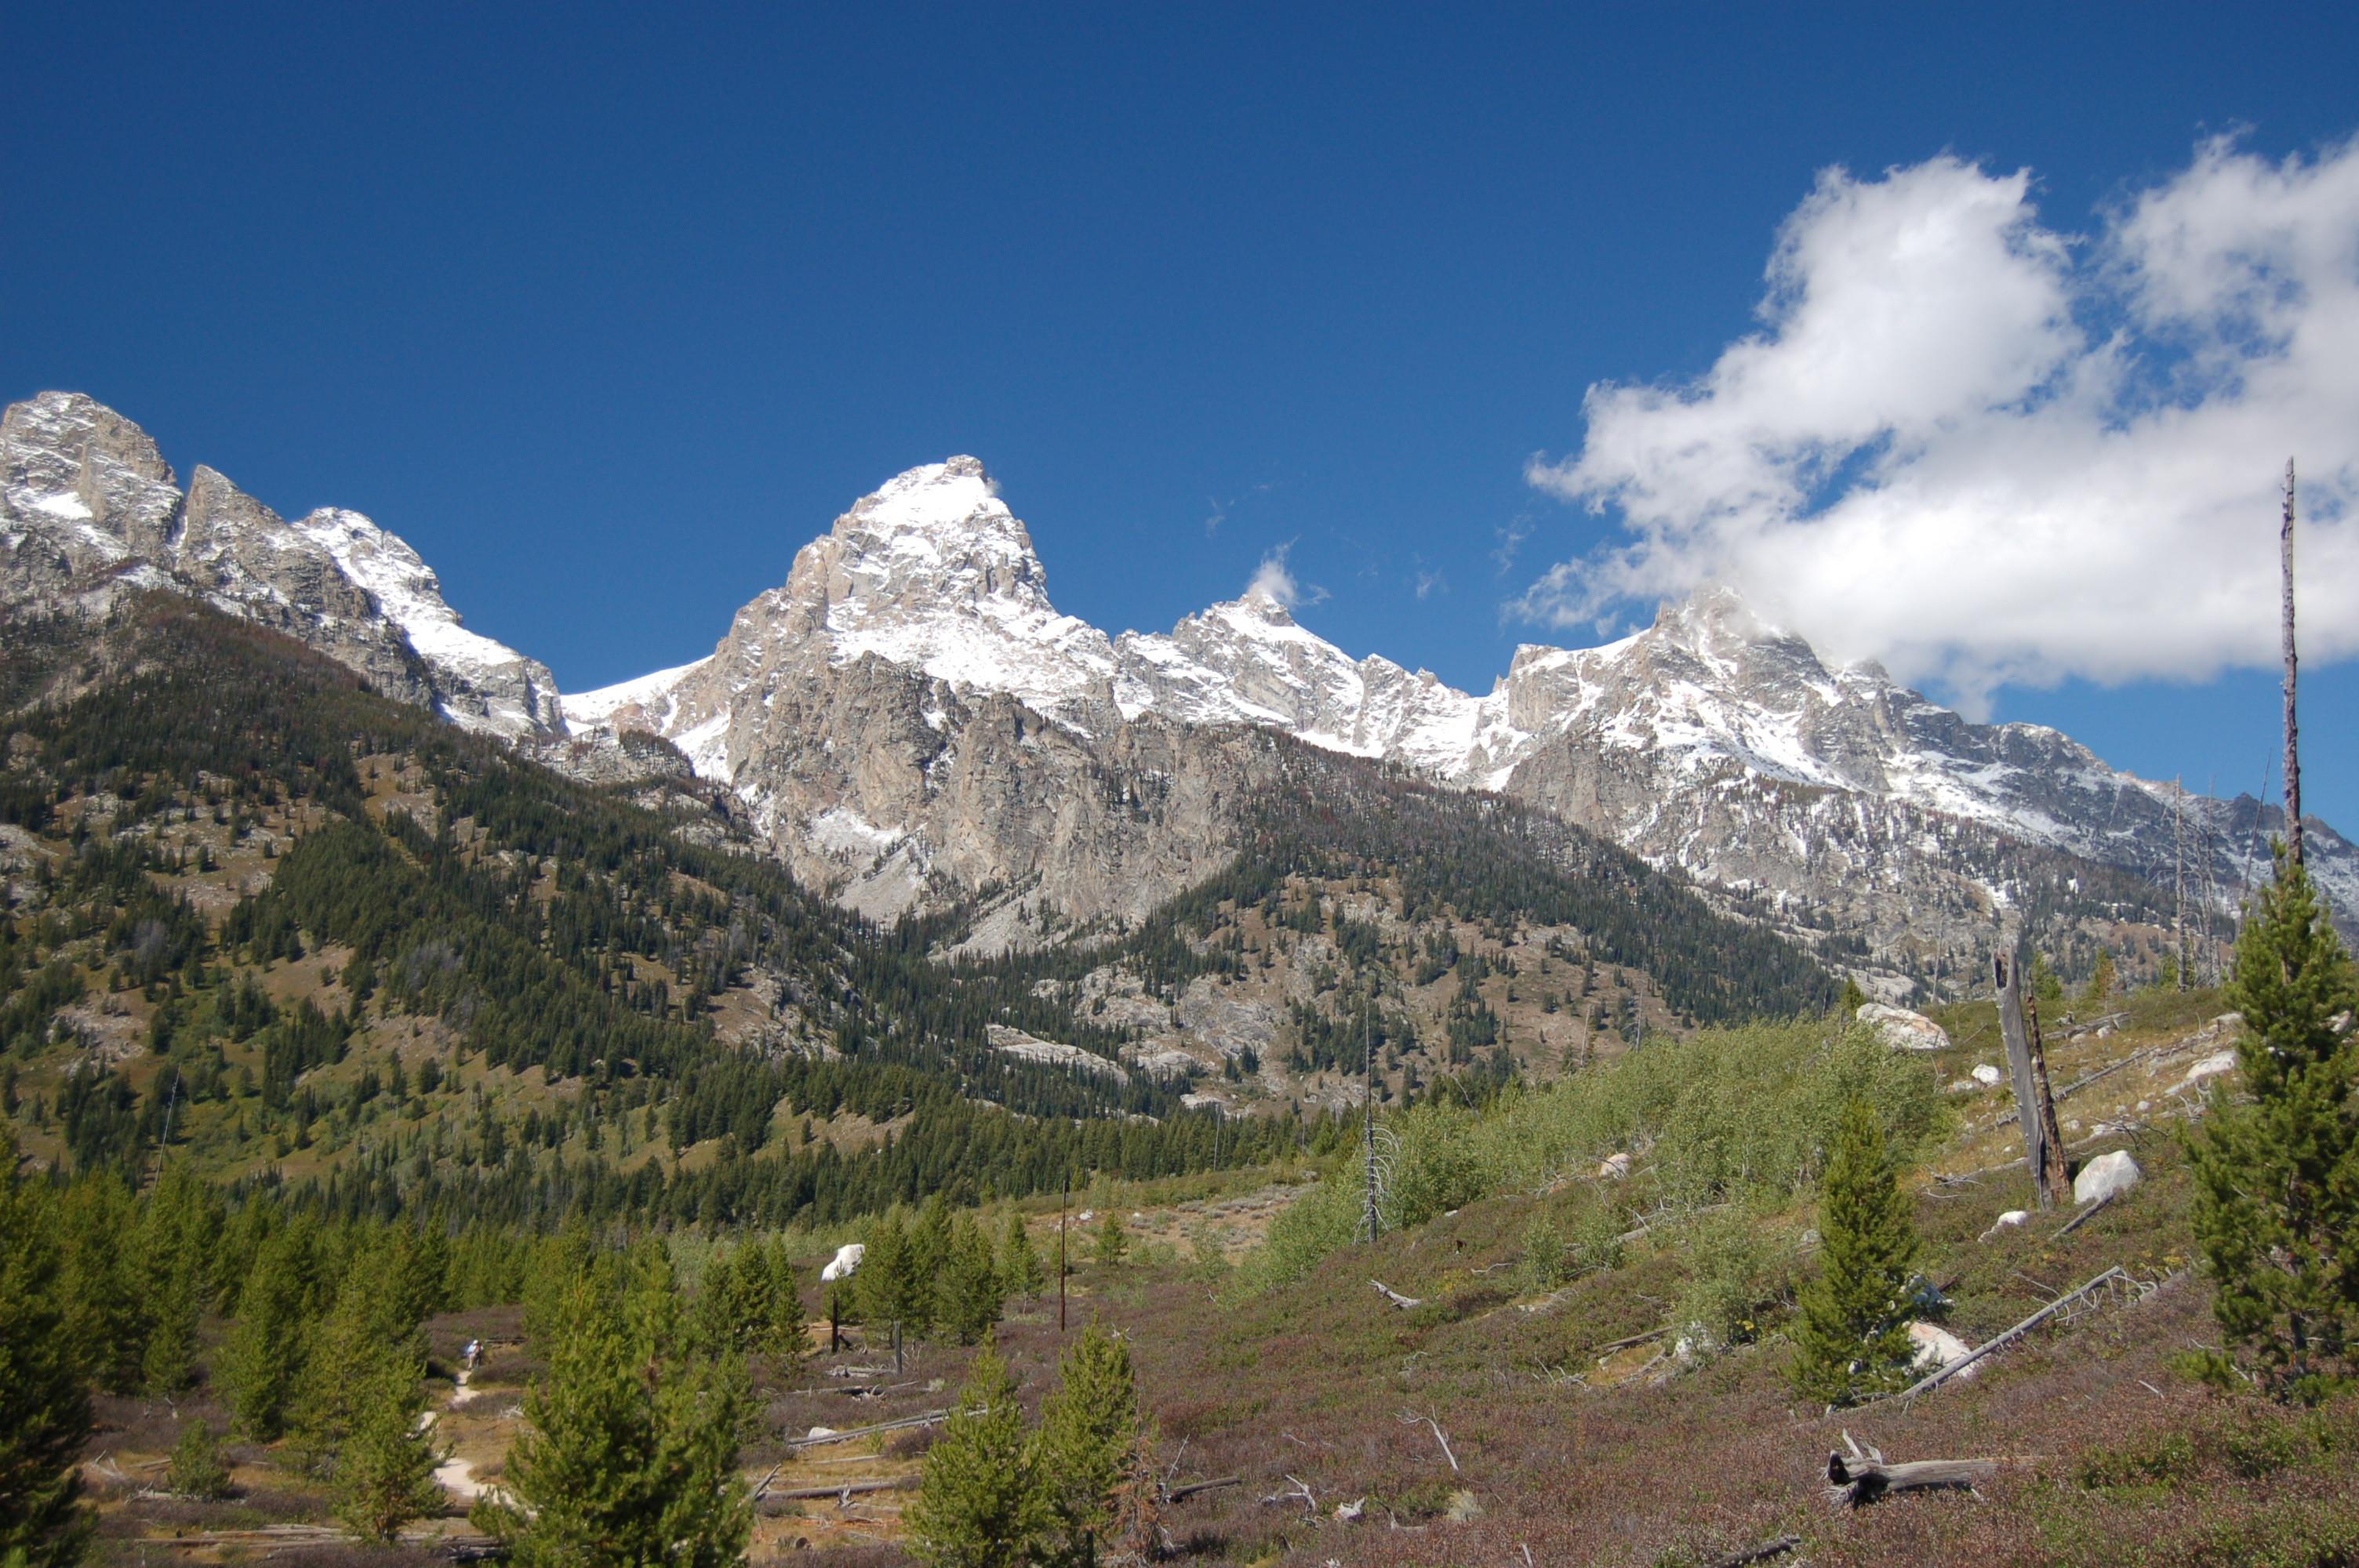 Fall Mountain Lake Wallpaper Rangers Respond To A Climbing Fatality On The Grand Teton